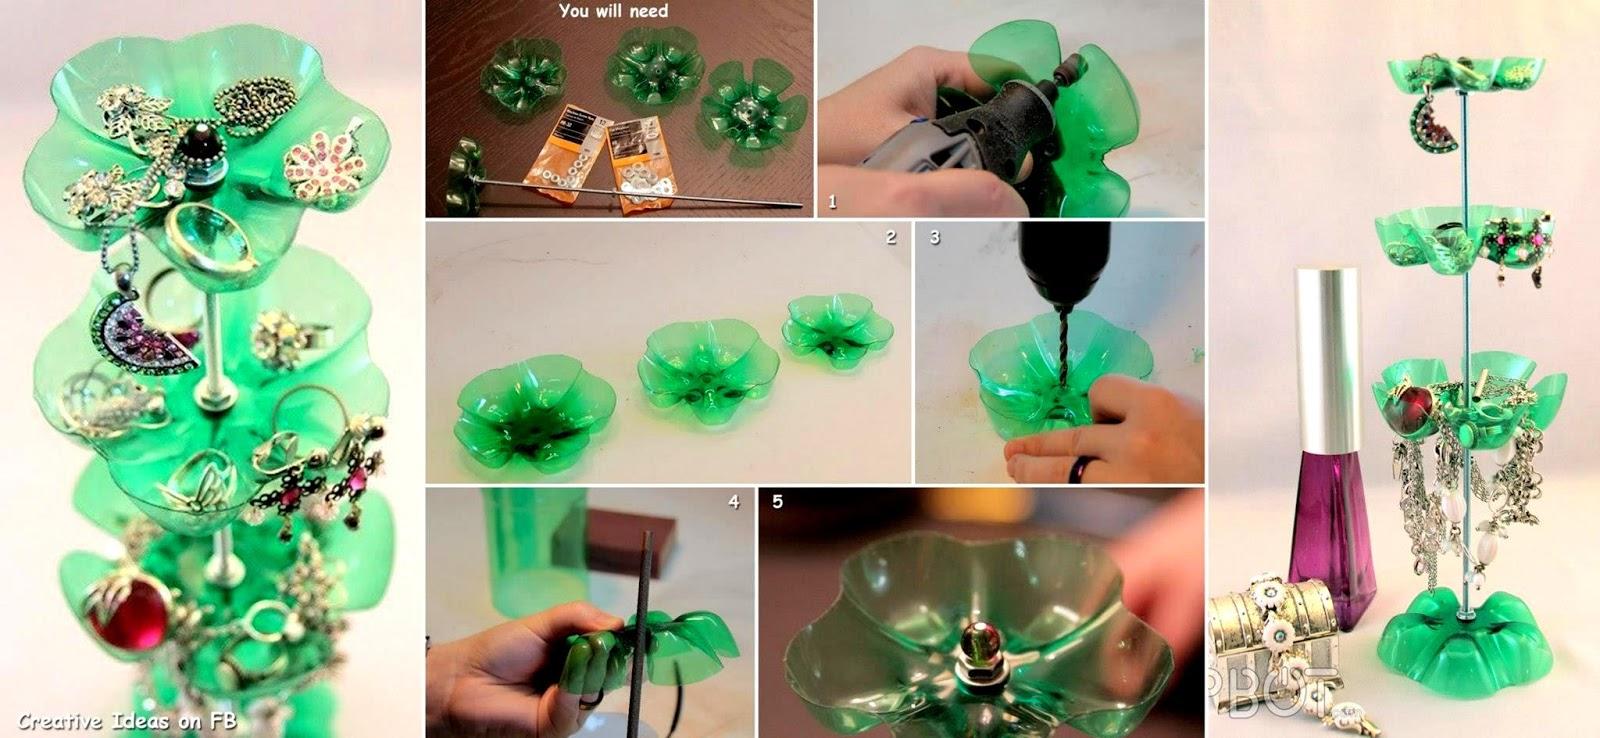 DIY Plastic Bottle Jewelry